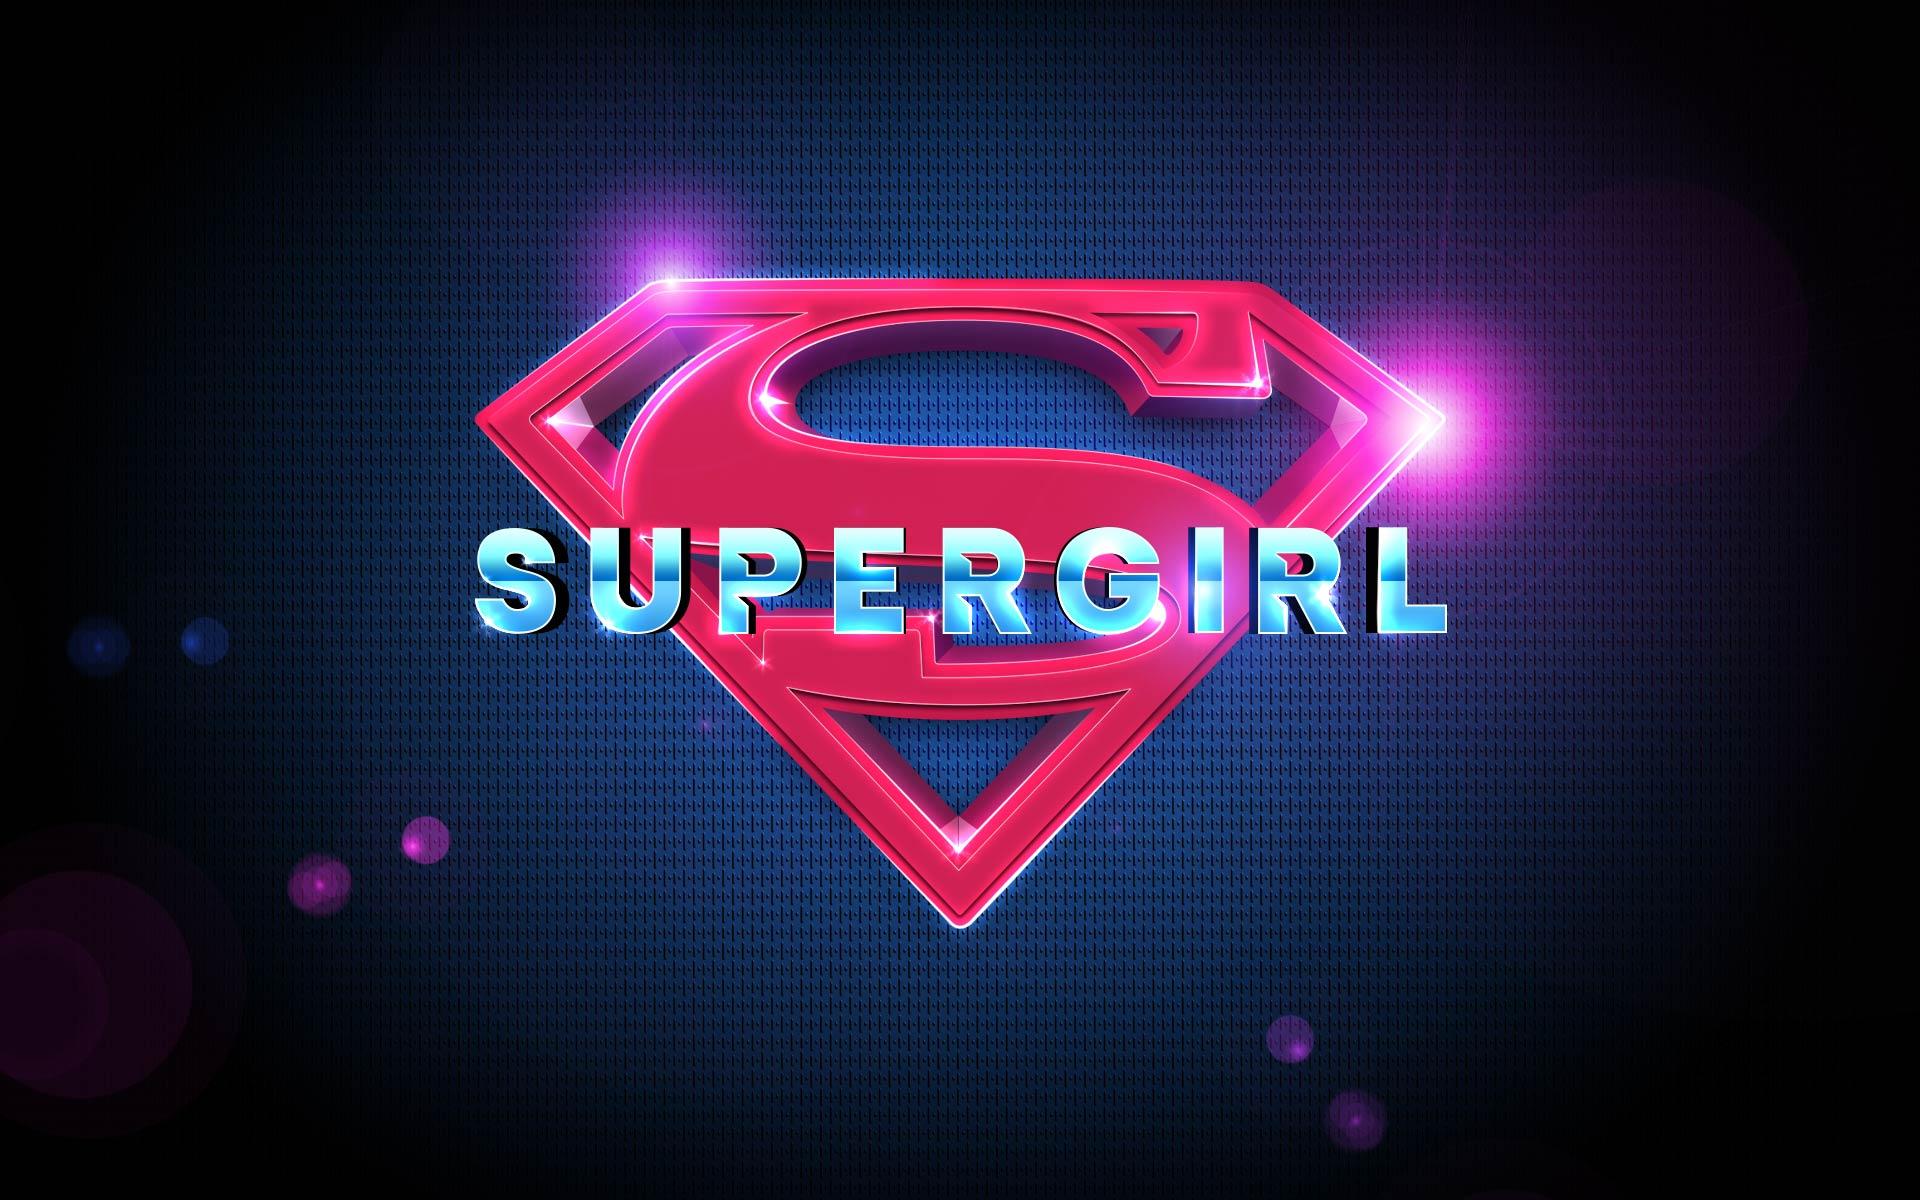 Must see Wallpaper Logo Supergirl - 009-desktop9  Snapshot_39486.jpg